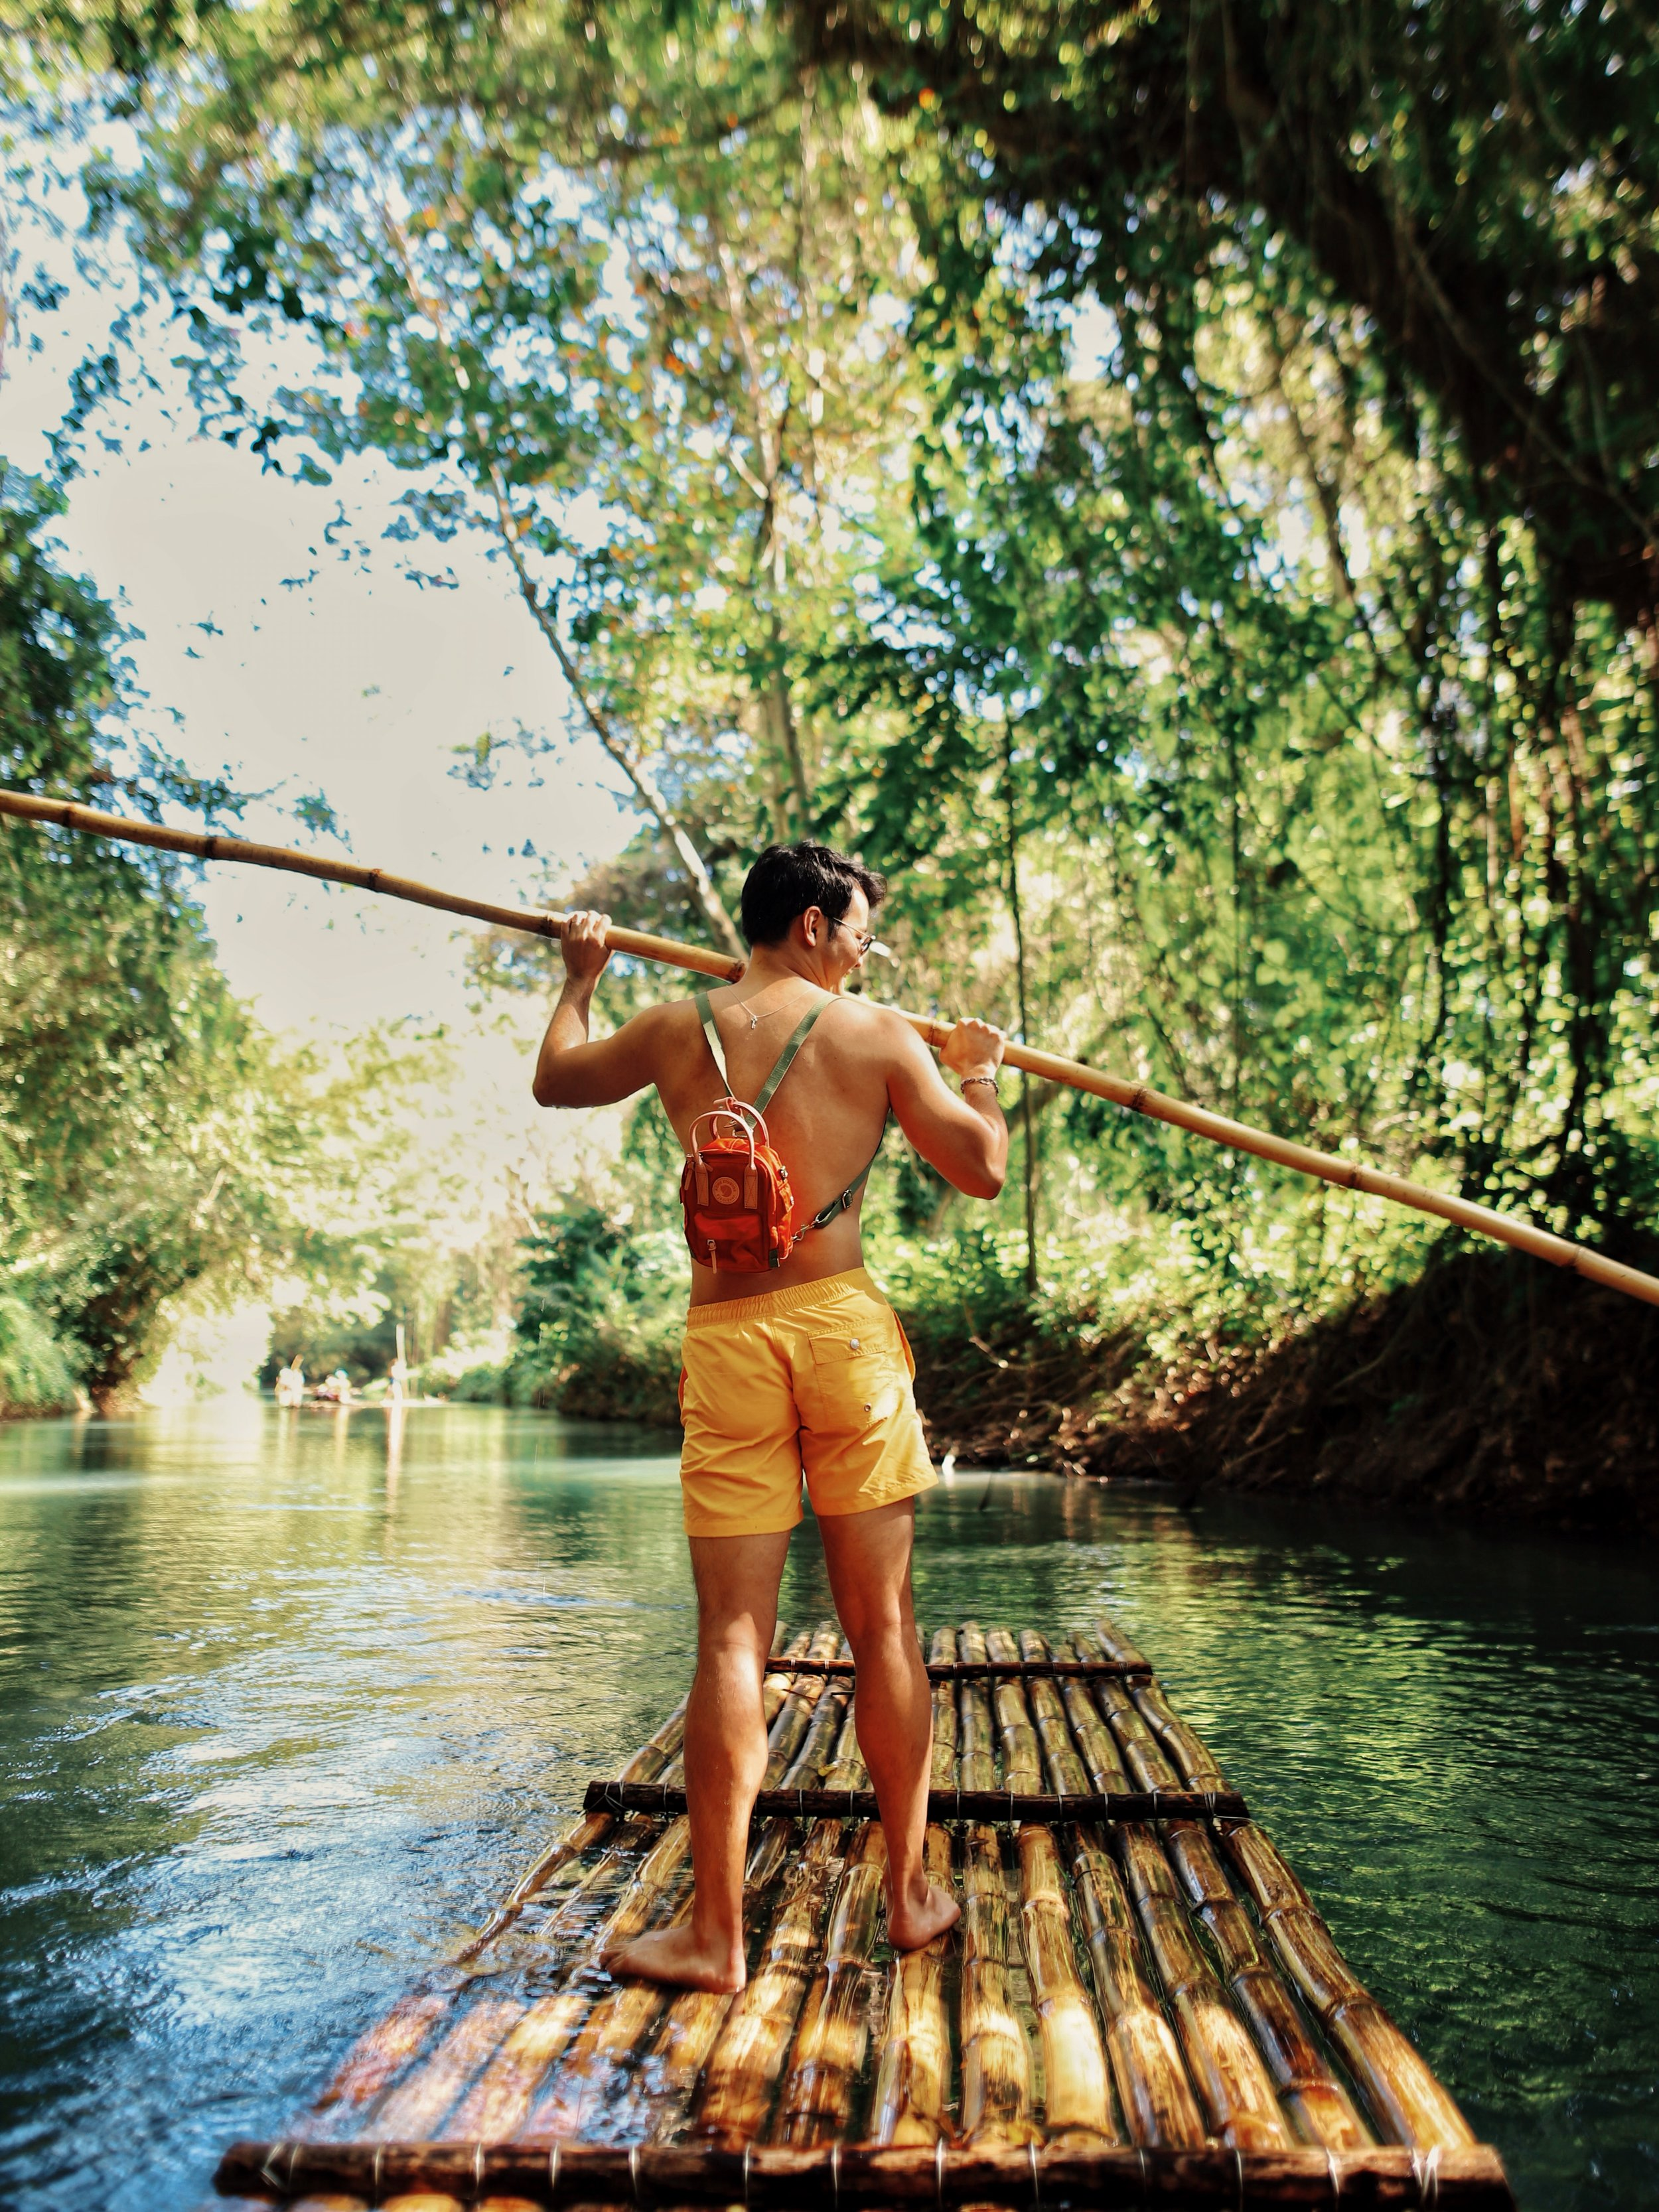 Jamaica Martha brae river rafting